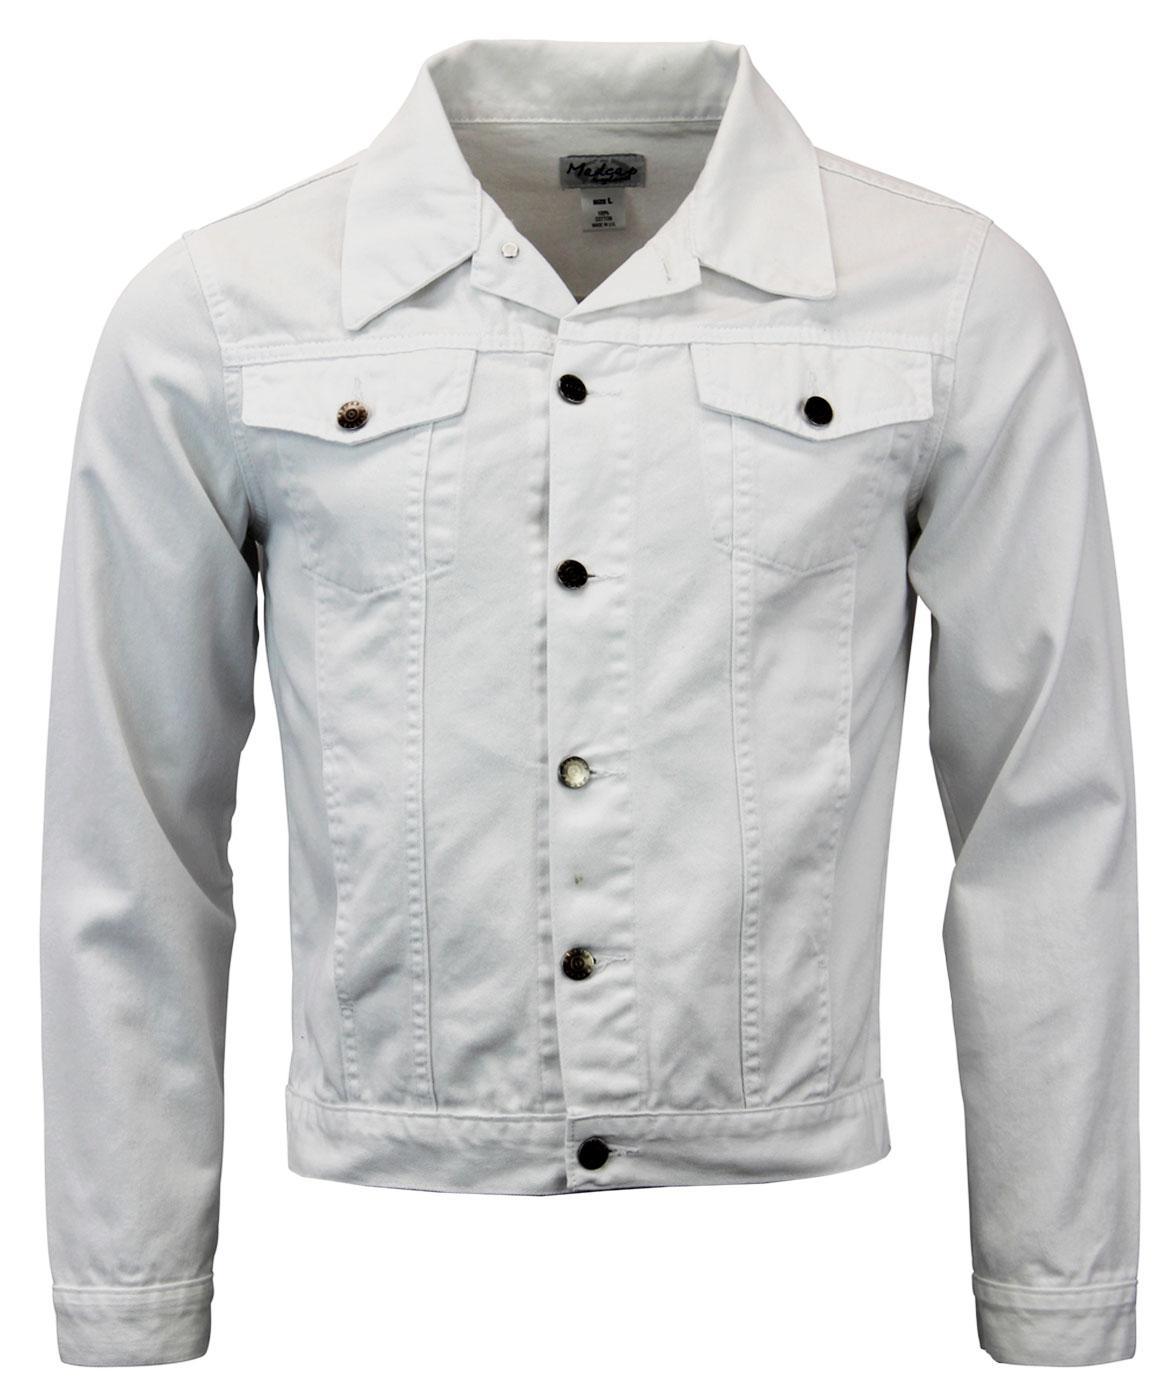 Marquee MADCAP ENGLAND Mod Denim Western Jacket W